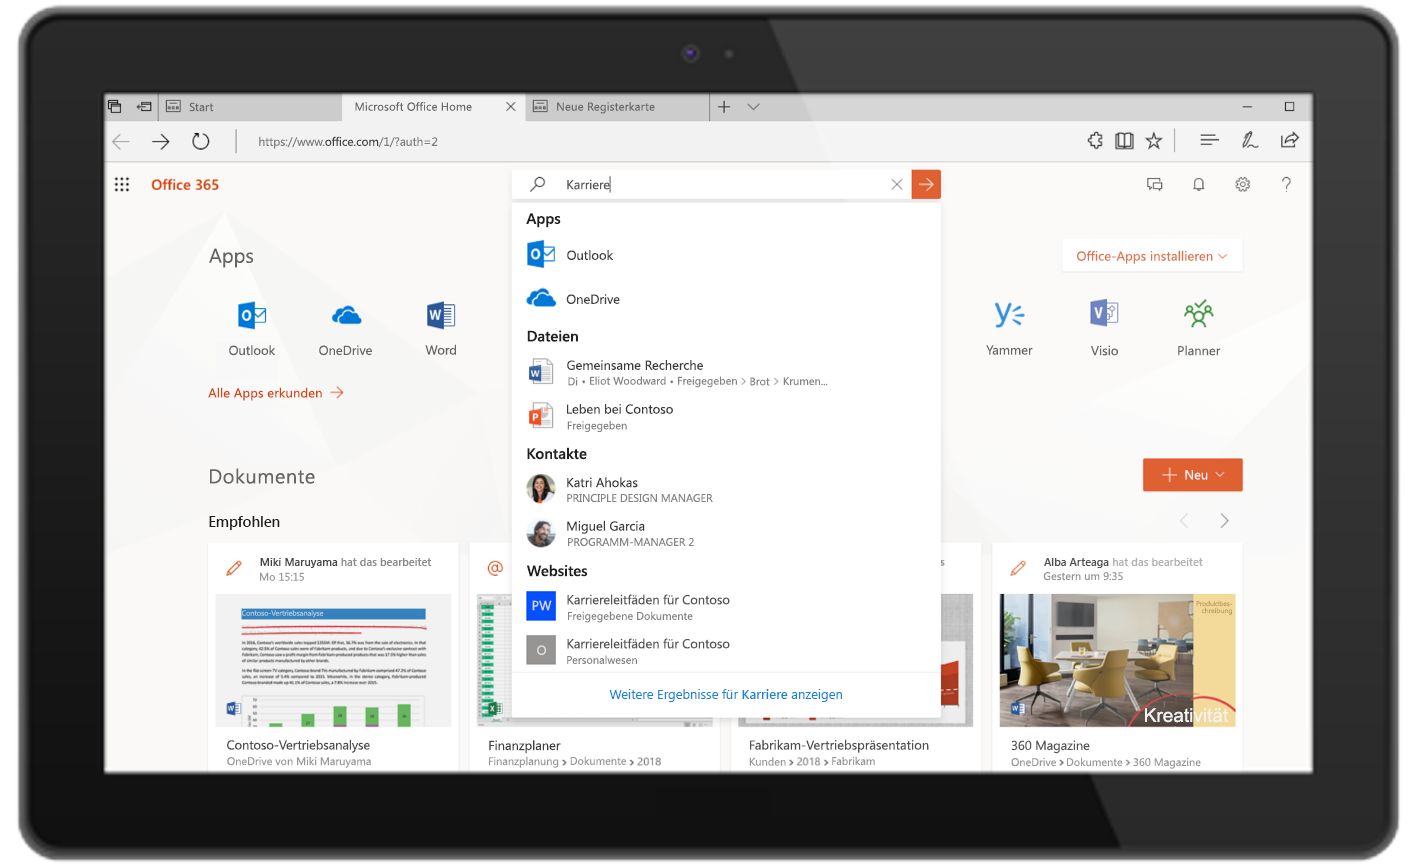 Abbildung von Microsoft Search in Office.com.